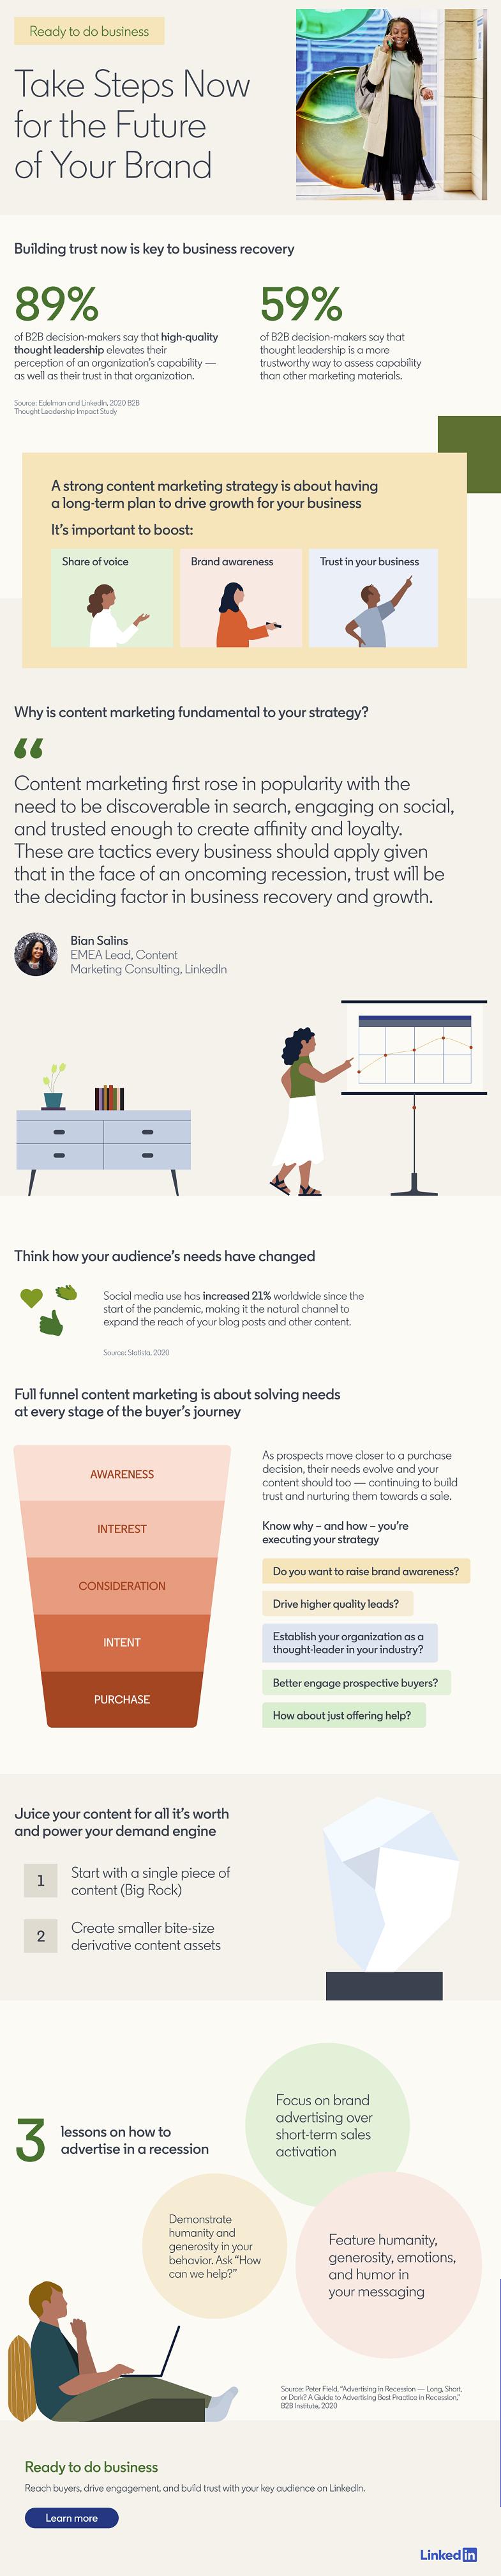 LinkedIn market perceptions infographic